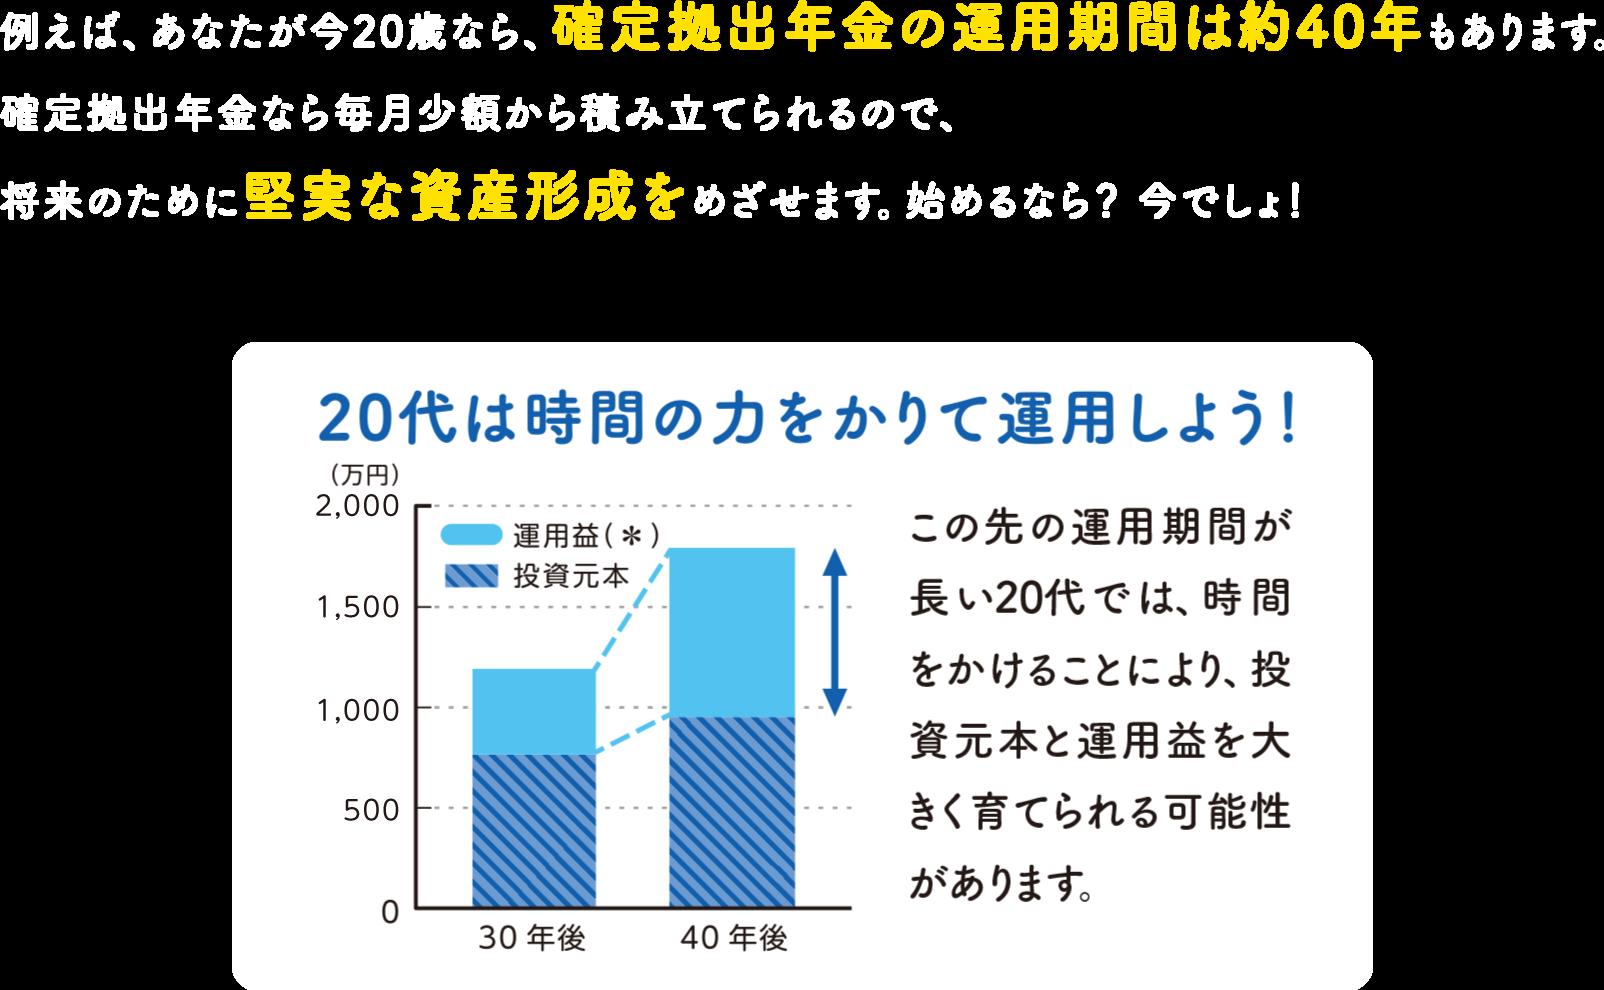 Mufg 確定 拠出 年金 確定拠出年金(DC):三菱UFJ信託銀行